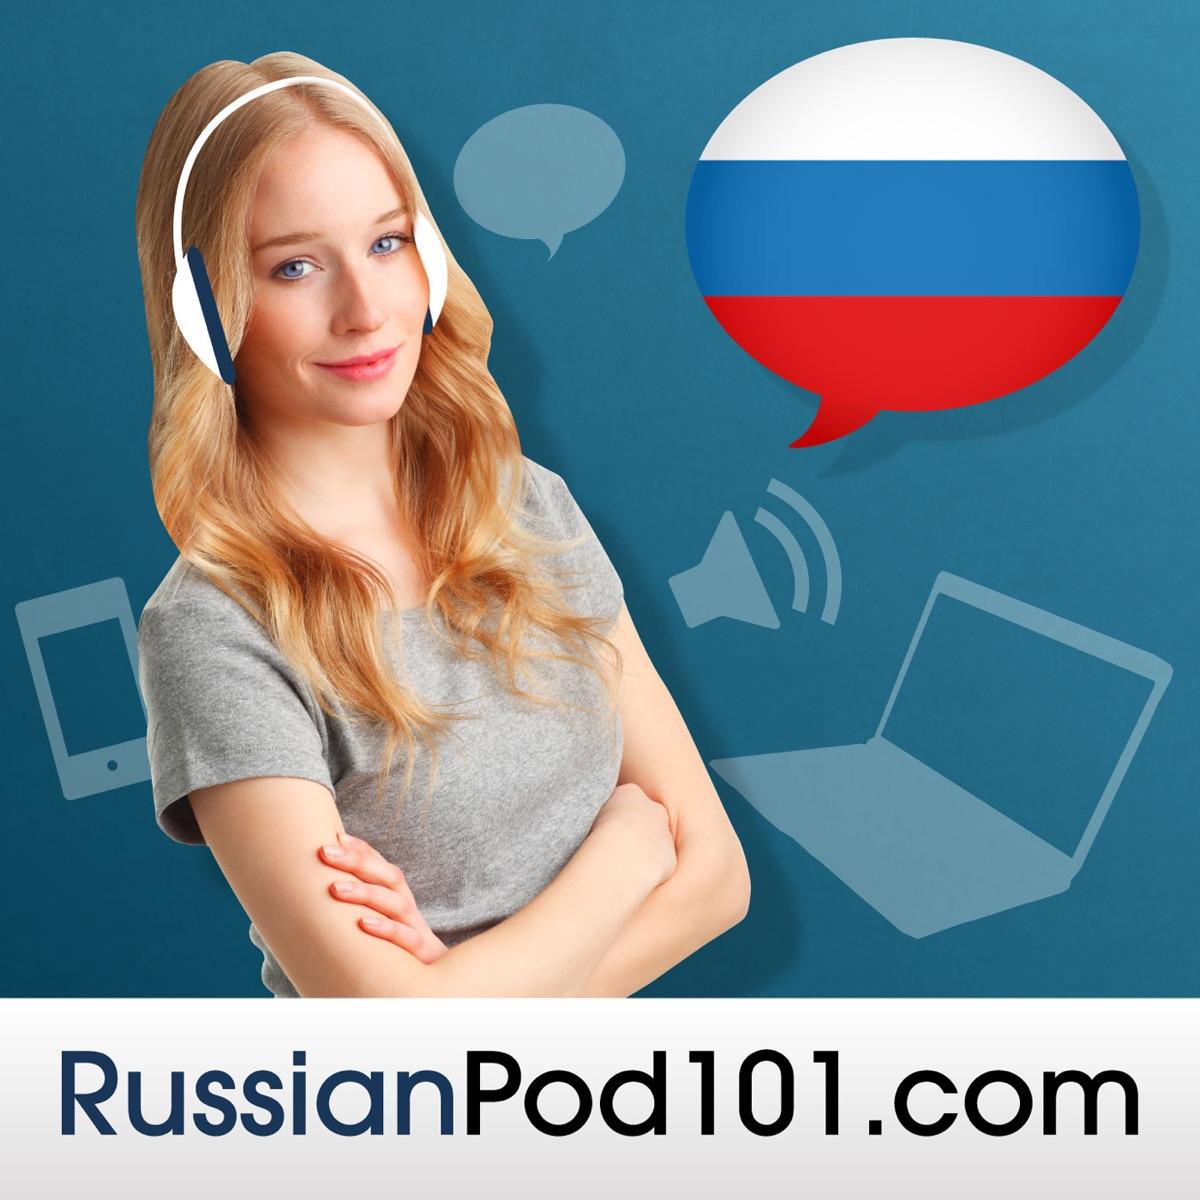 Learn Russian   RussianPod101.com